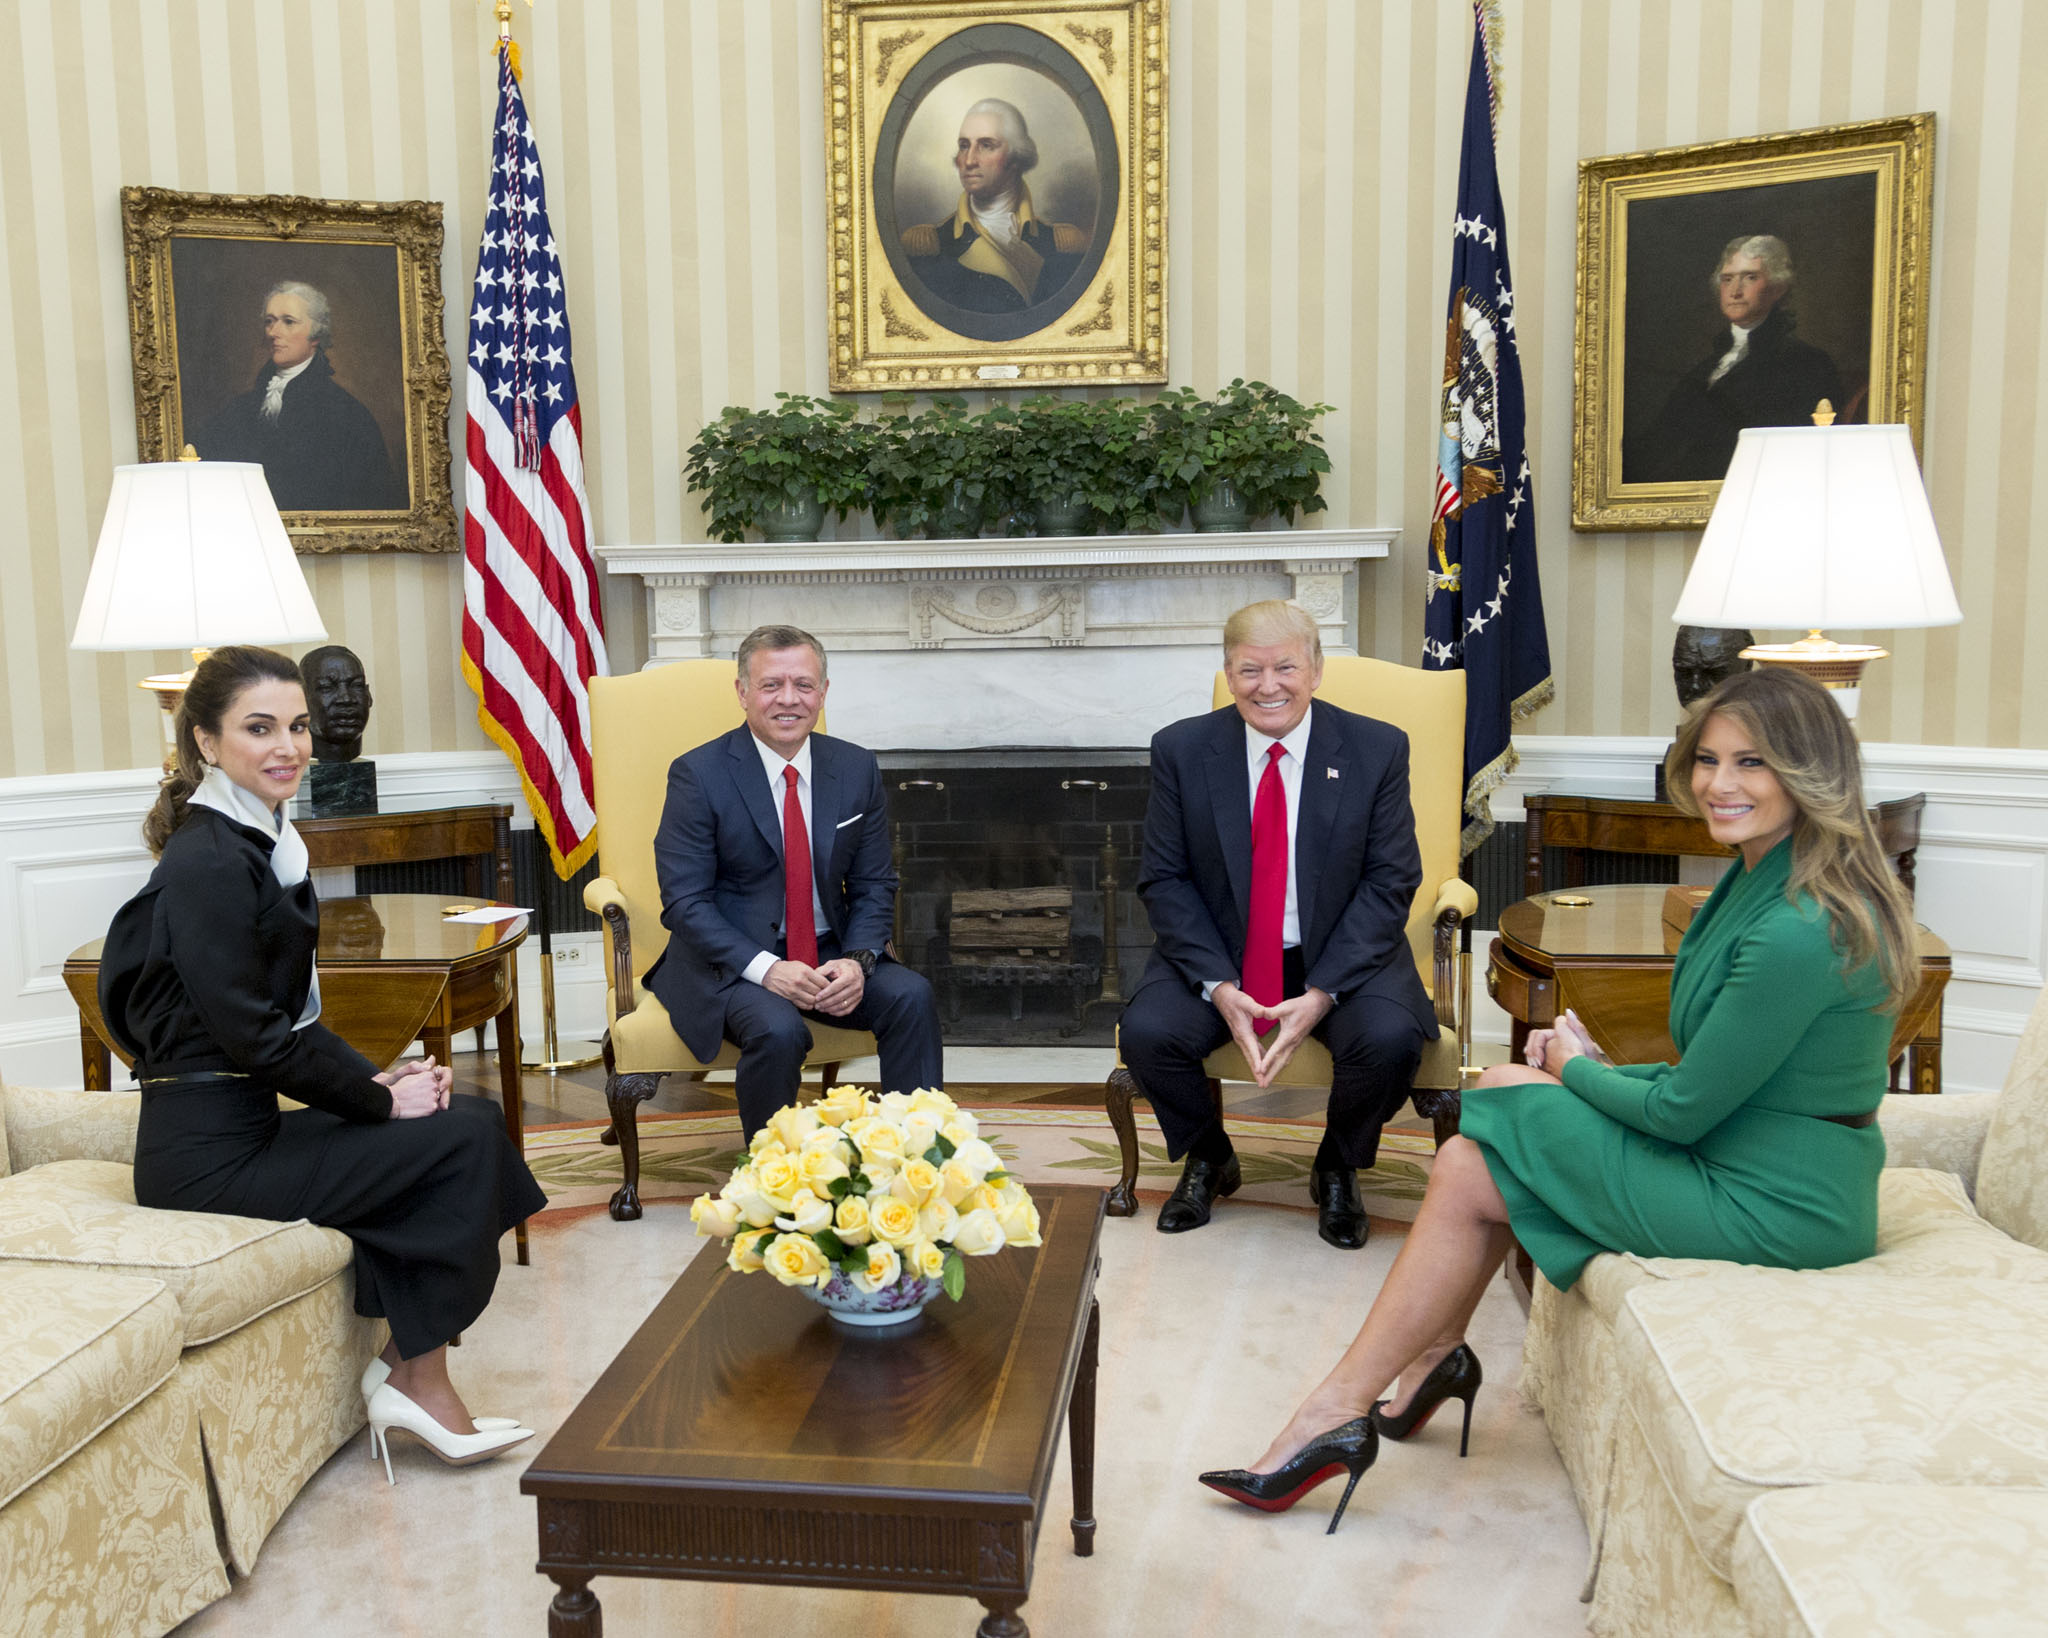 c9b8d3de2982 Abdullah meets with U.S. President Donald Trump in Washington